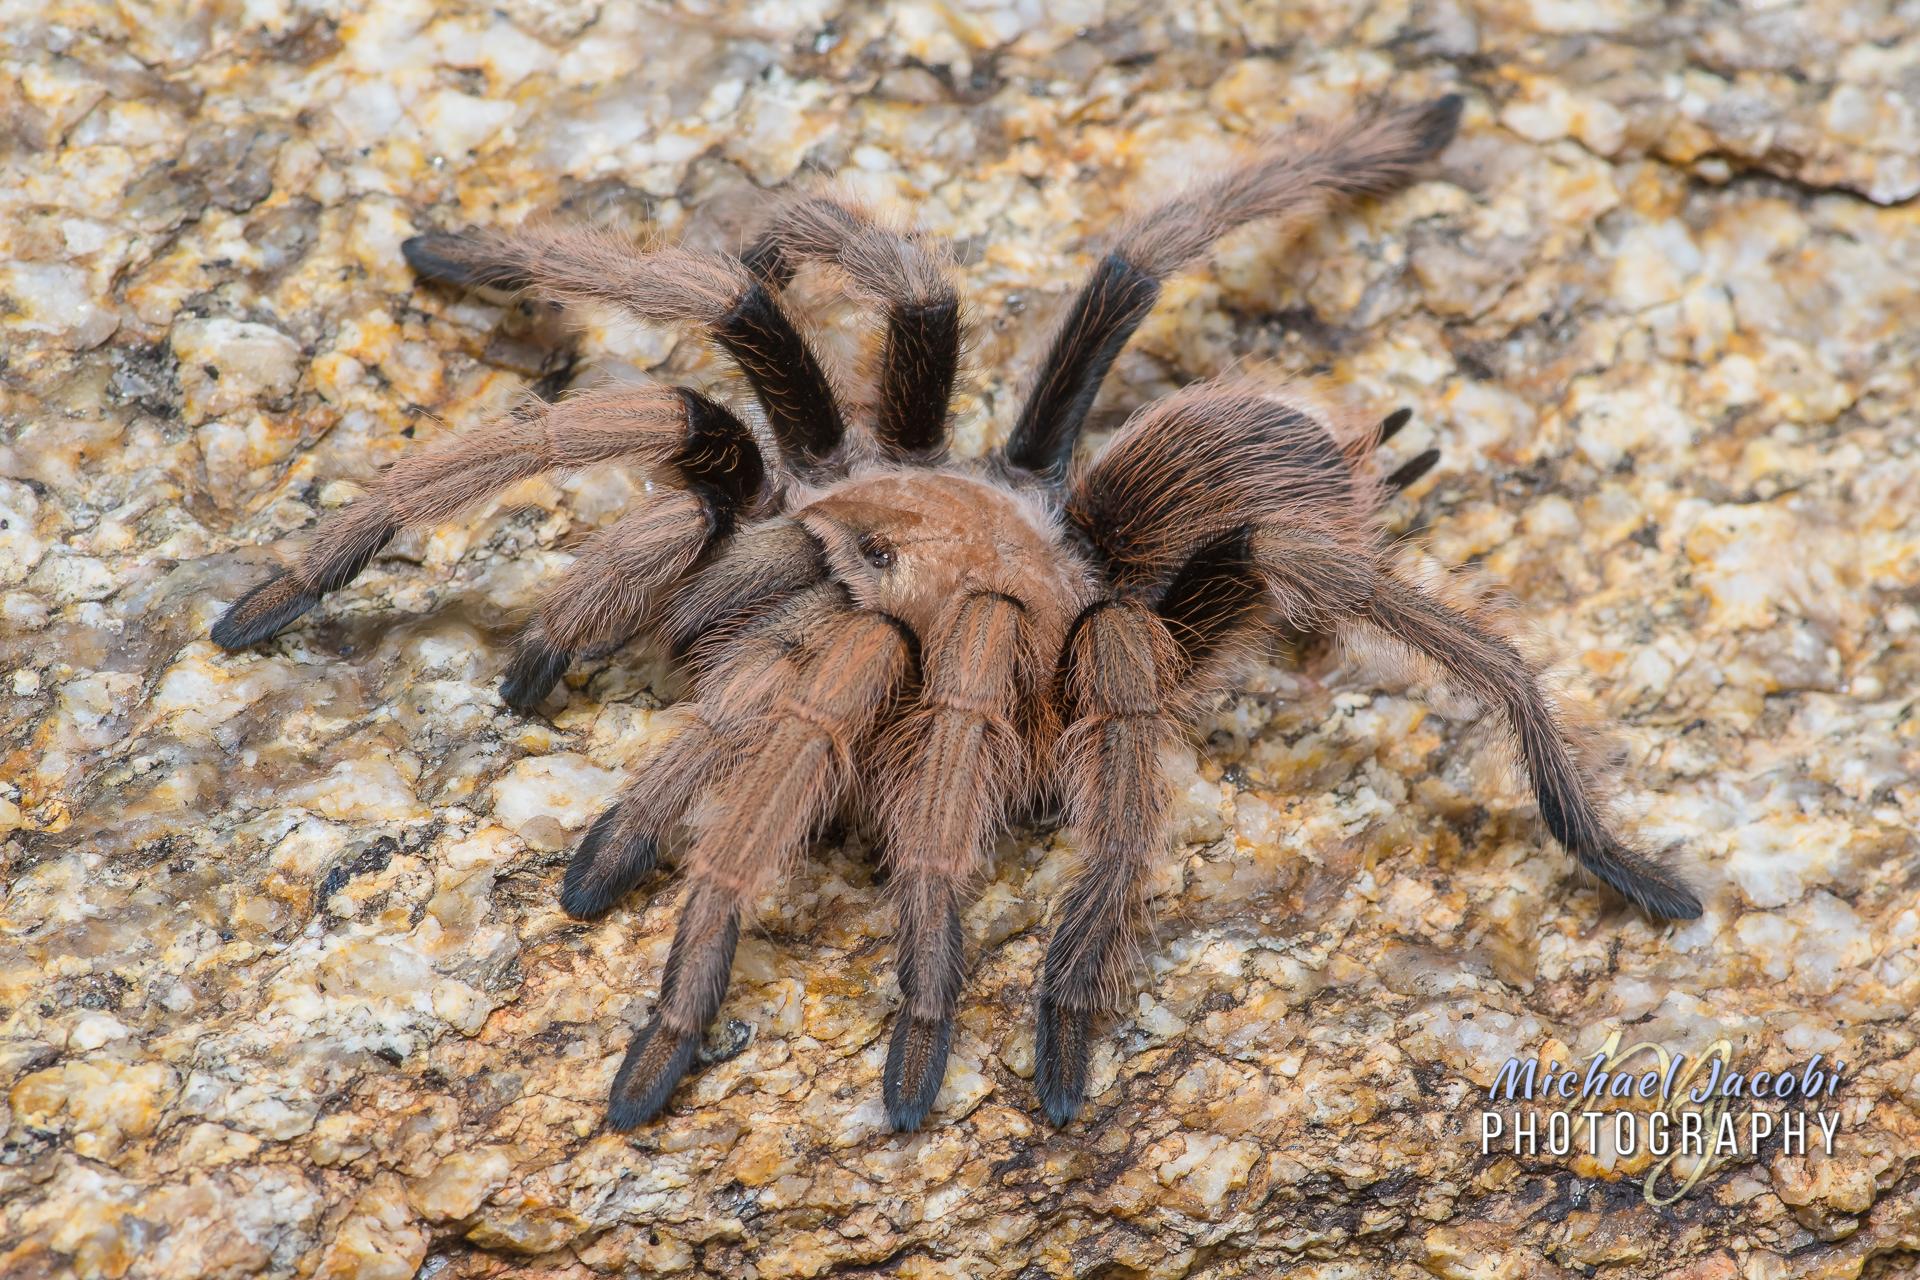 Aphonopelma chalcodes , Desert Blonde Tarantula, Catalina Mountains, AZ